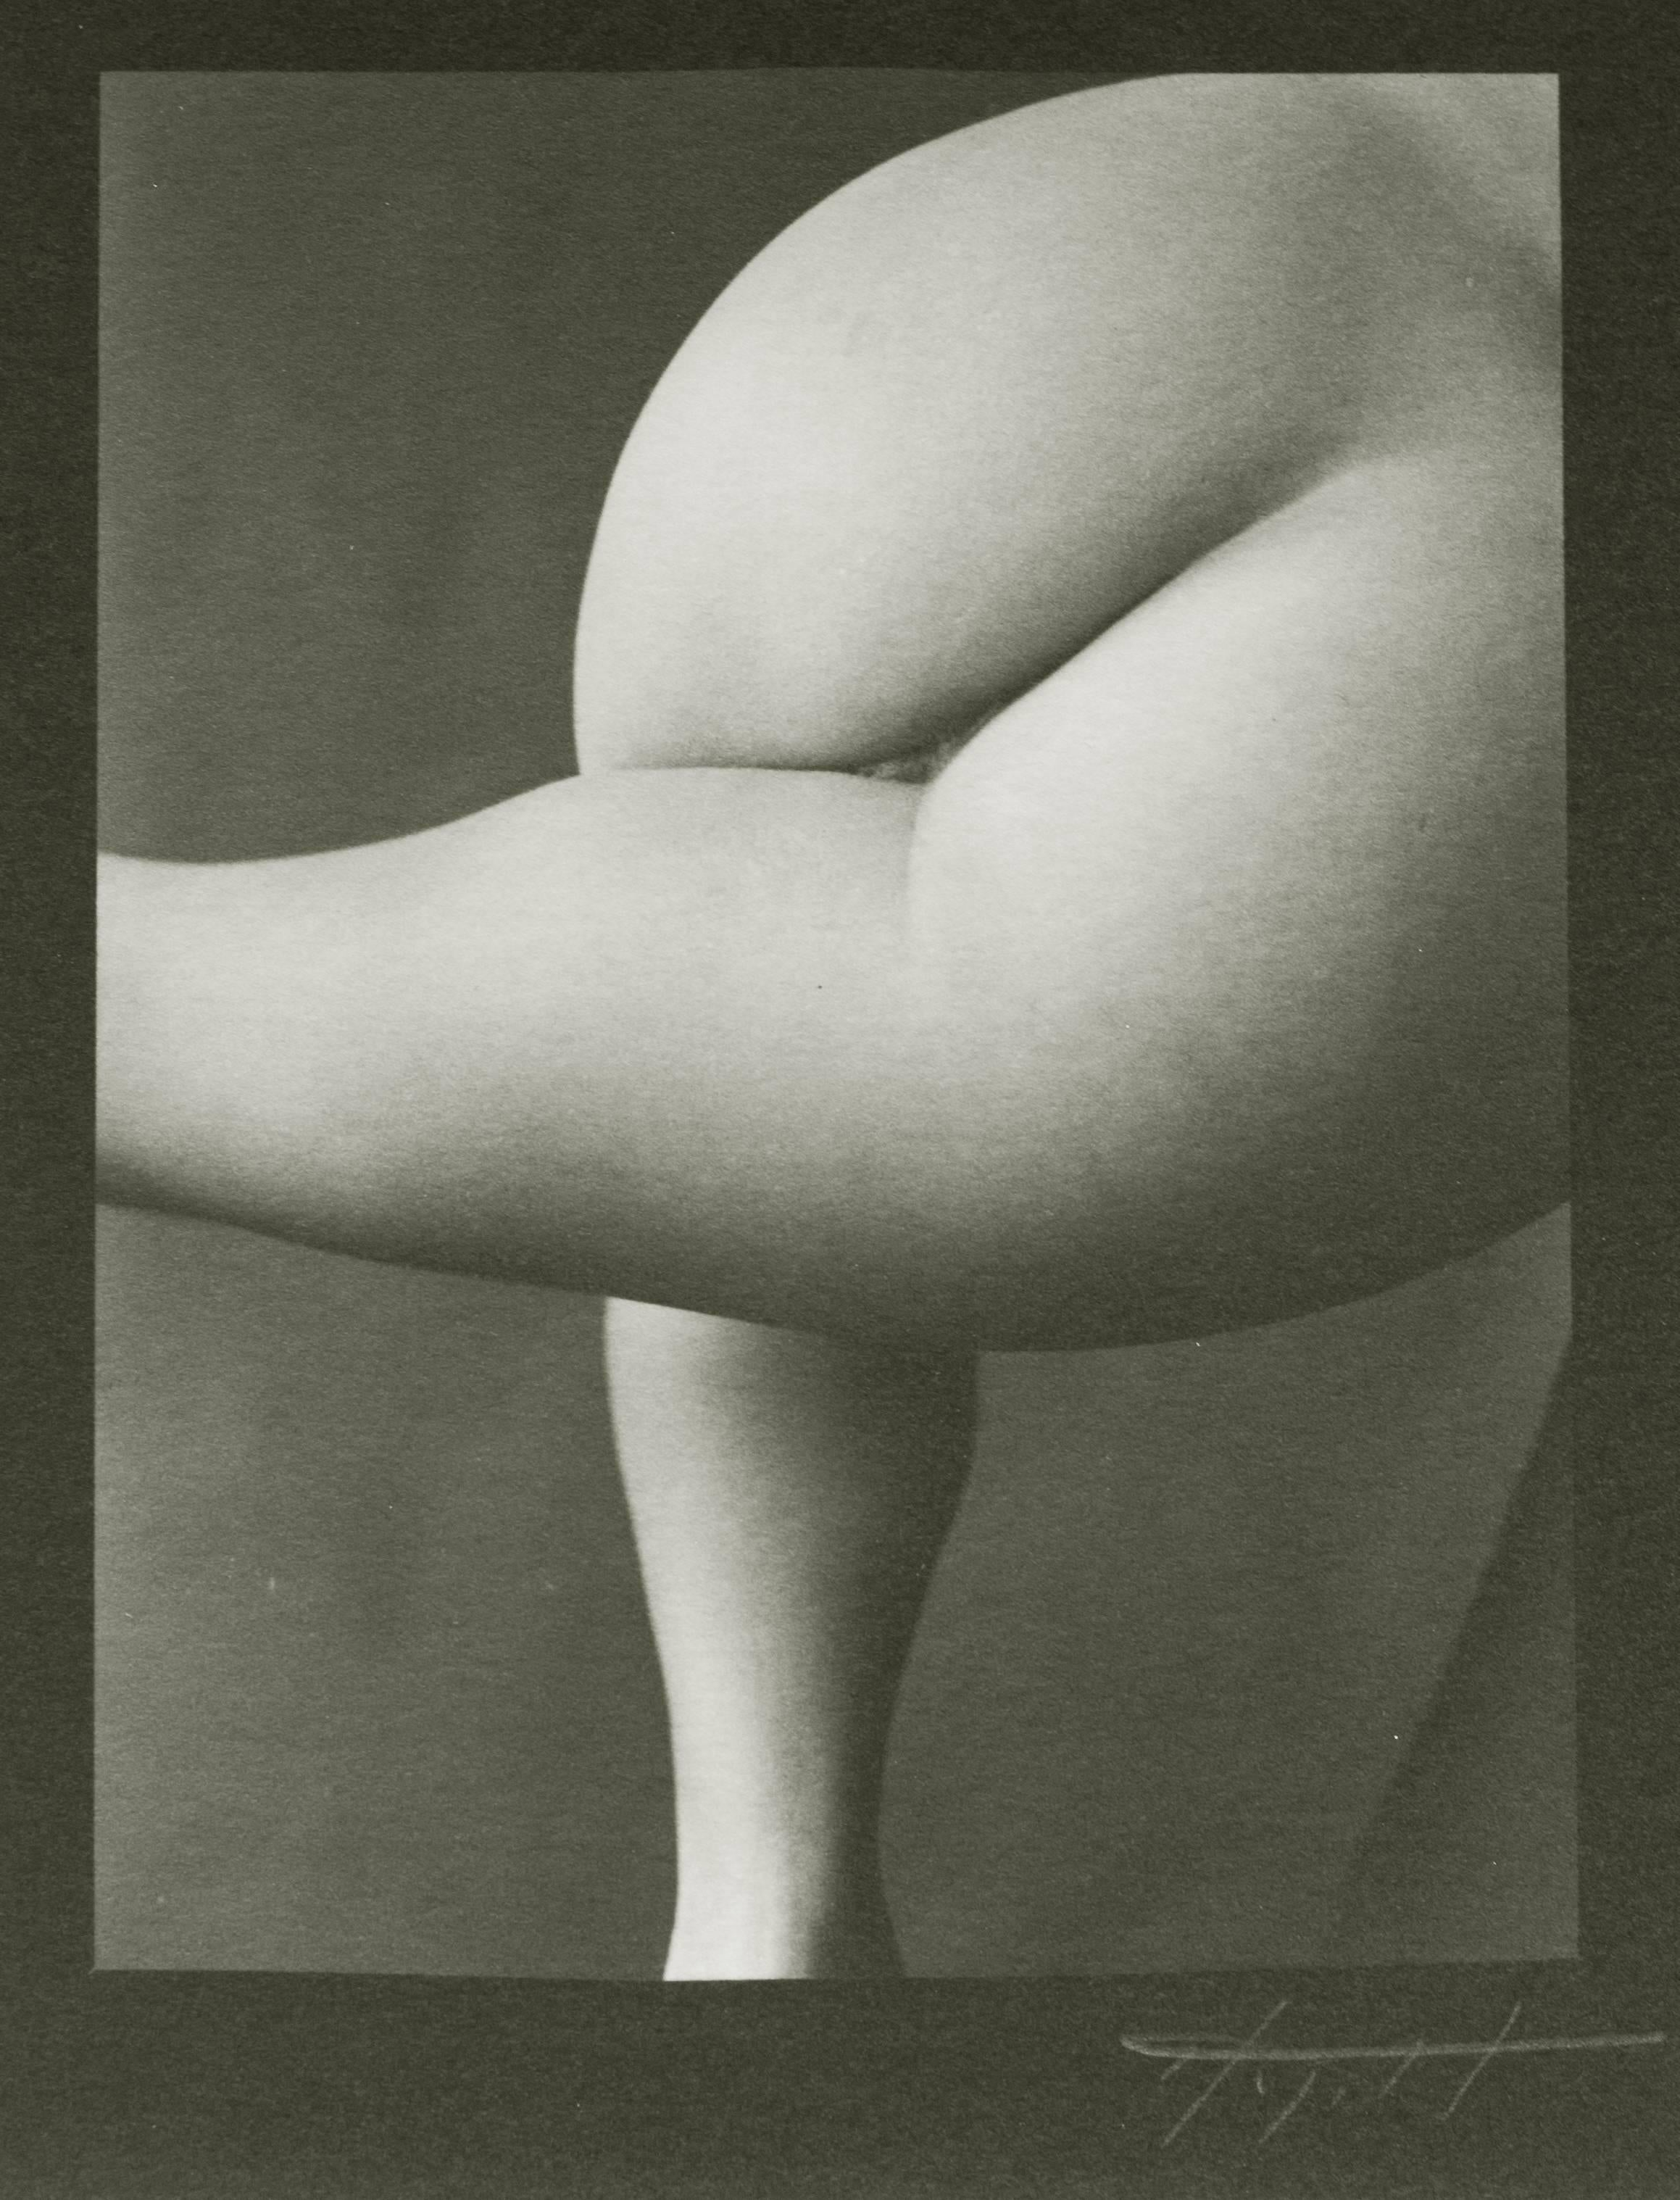 Nude #61, Abstract Female Nude Platinum Print